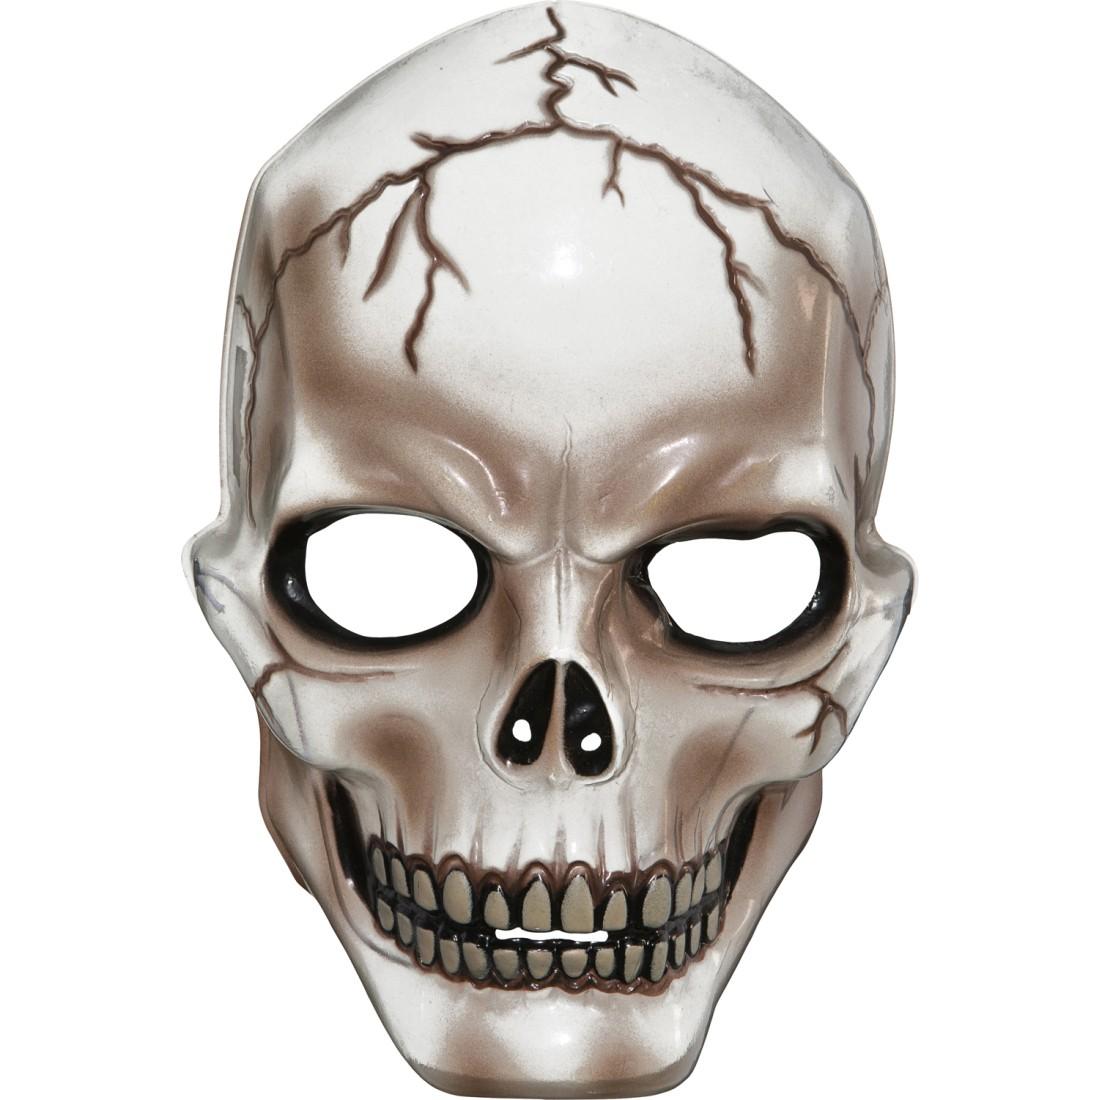 totenkopf maske totensch del horrormaske durchsichtig 5 49. Black Bedroom Furniture Sets. Home Design Ideas